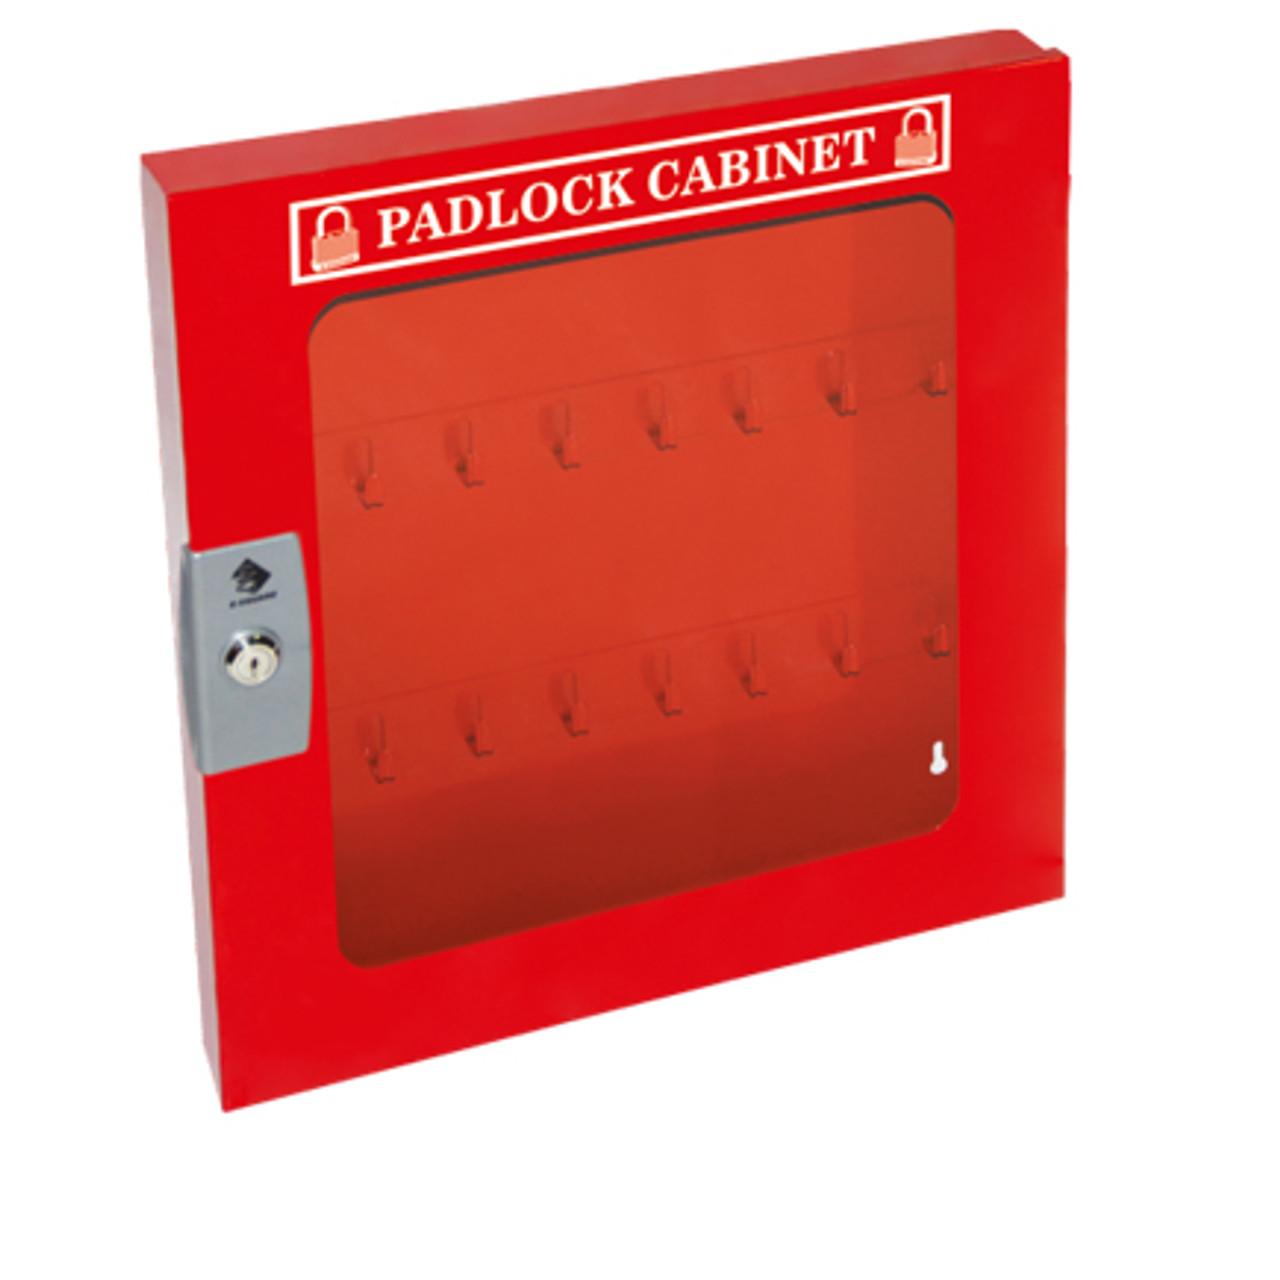 Padlock Cabinet, Red Steel, 55 Padlock Capacity